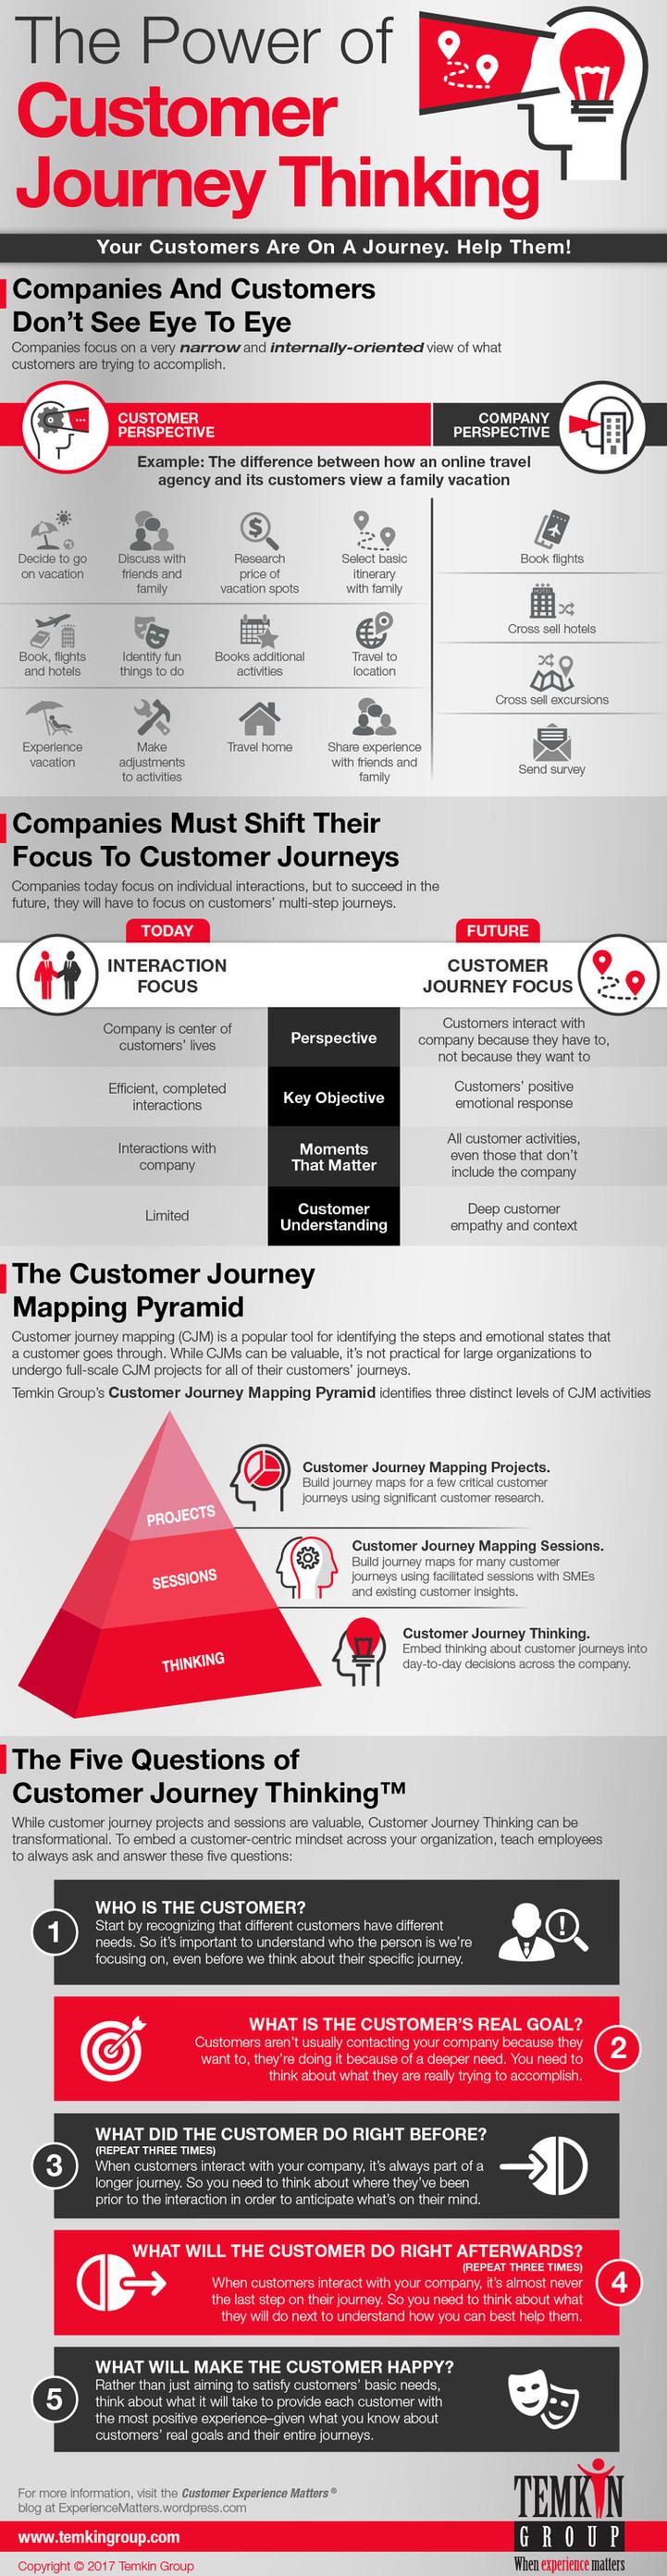 The Power of Customer Journey Thinking